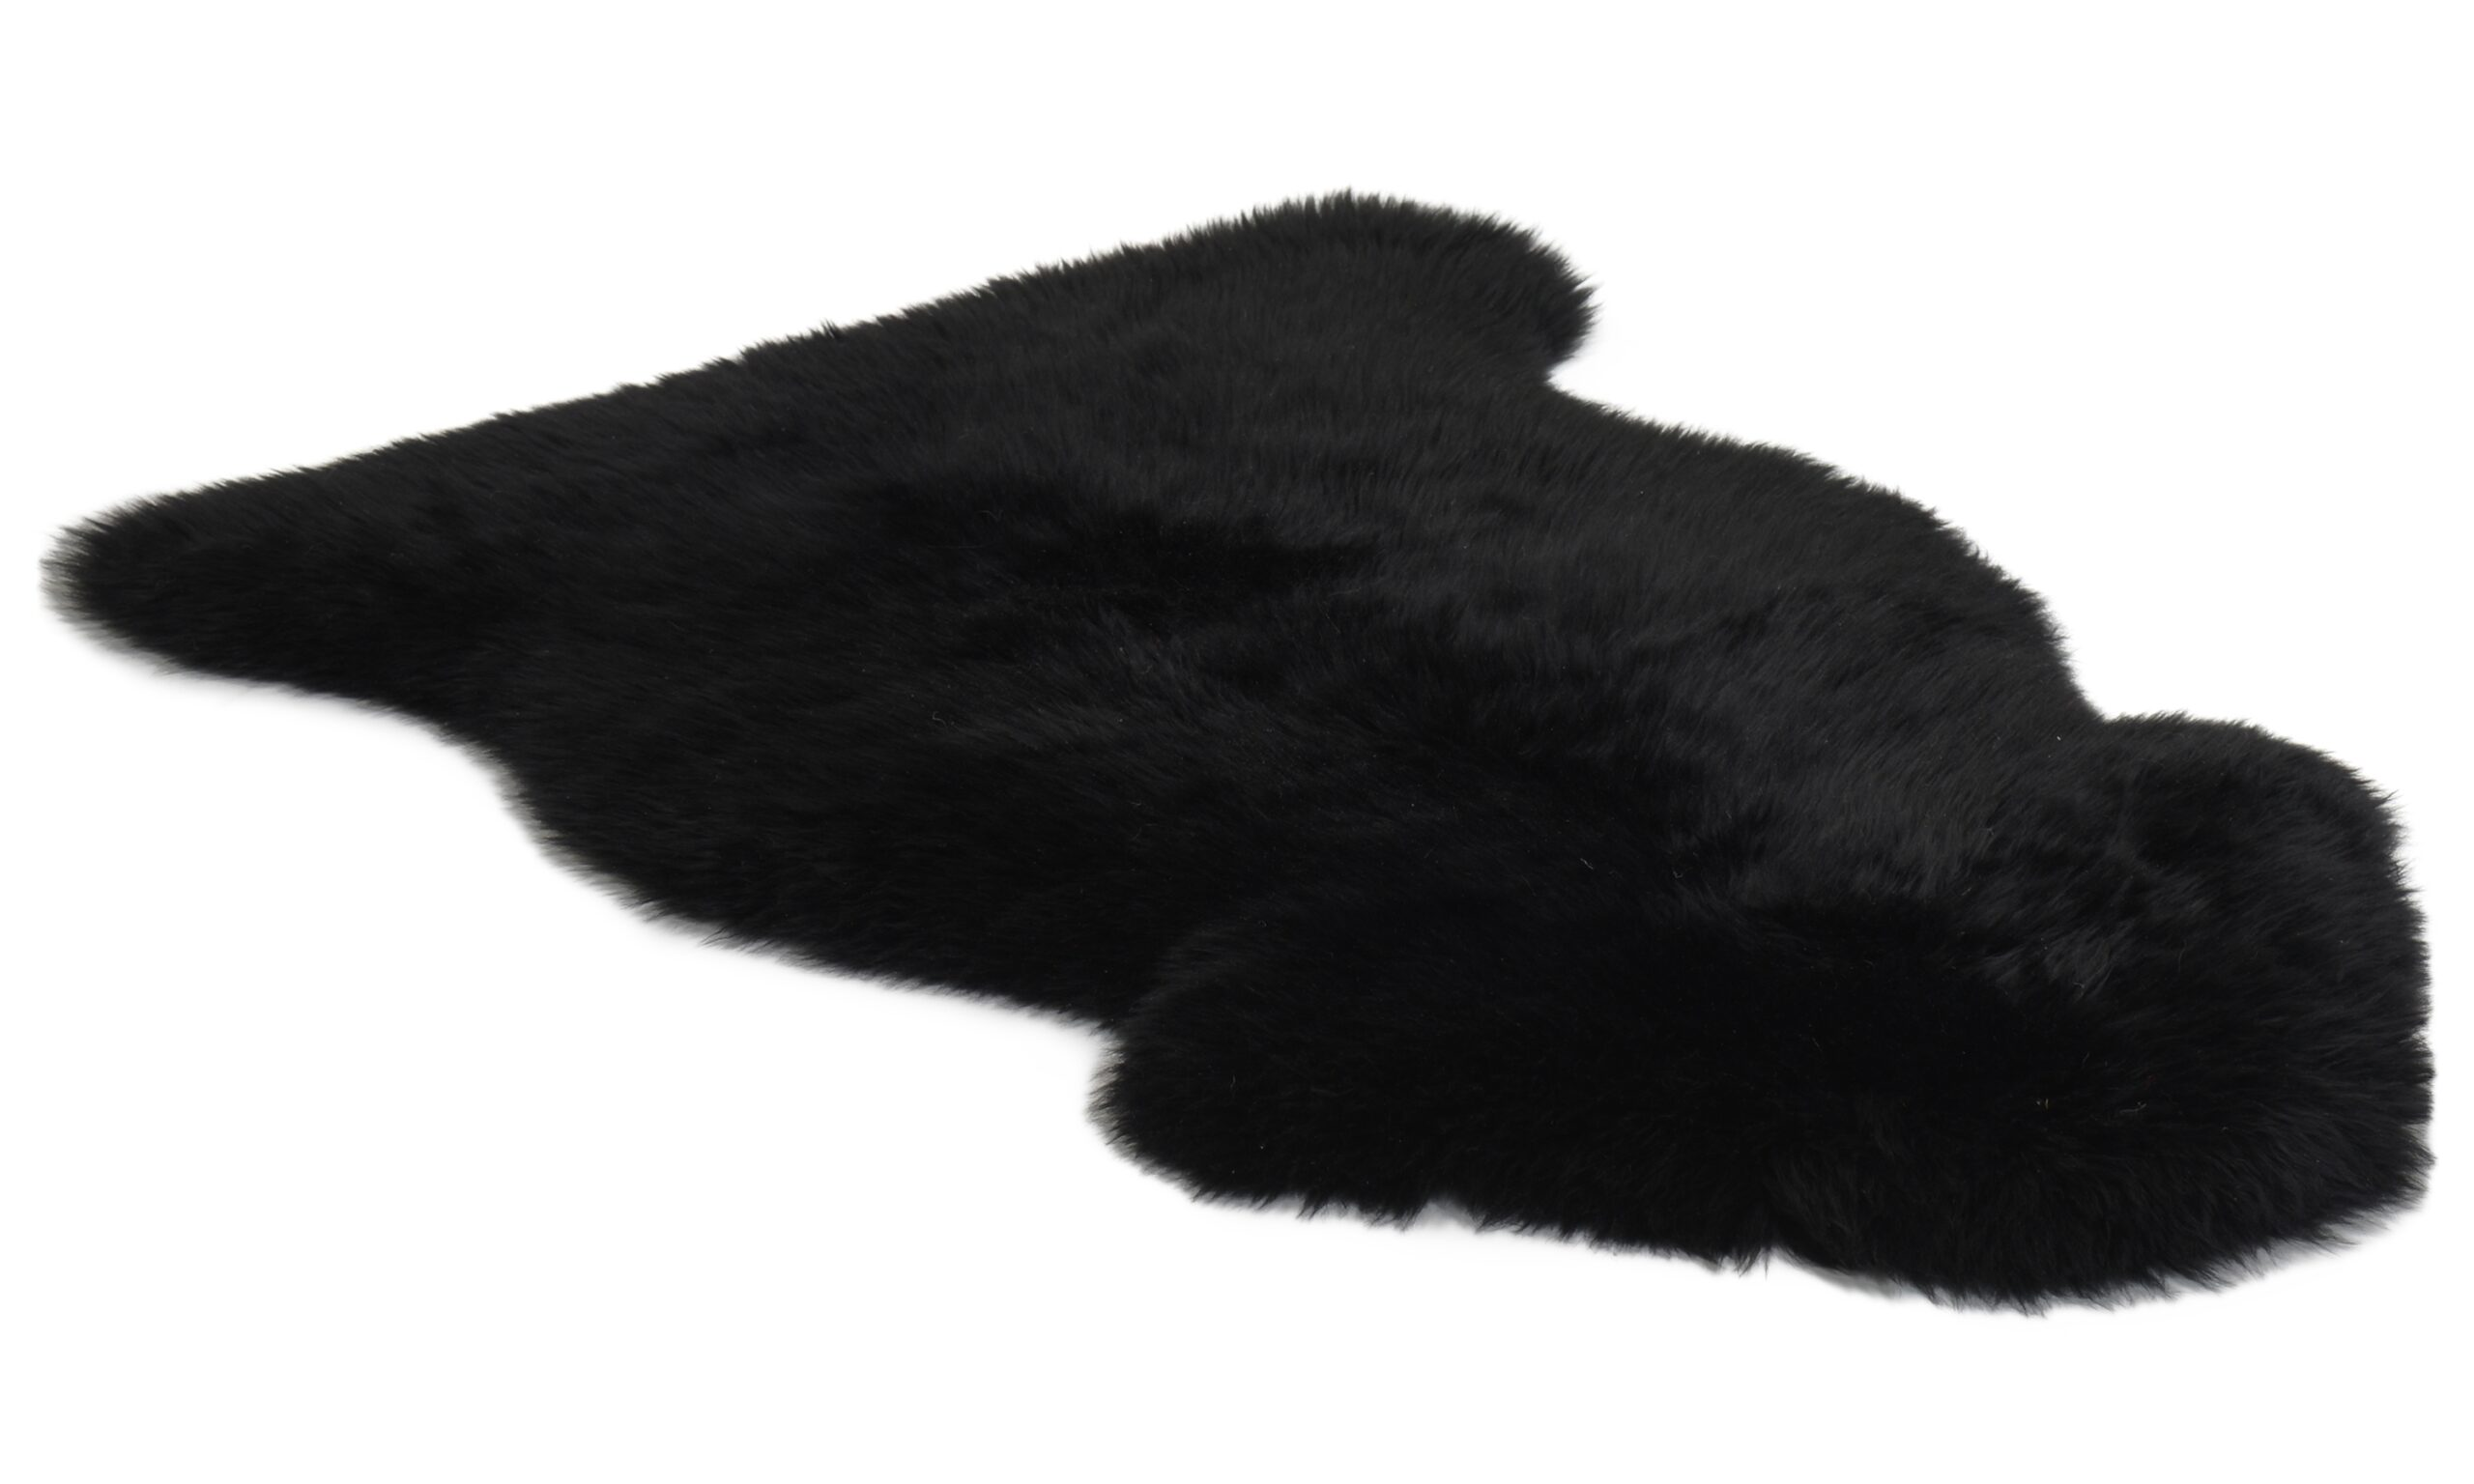 Långhårigt fårskinn - svart